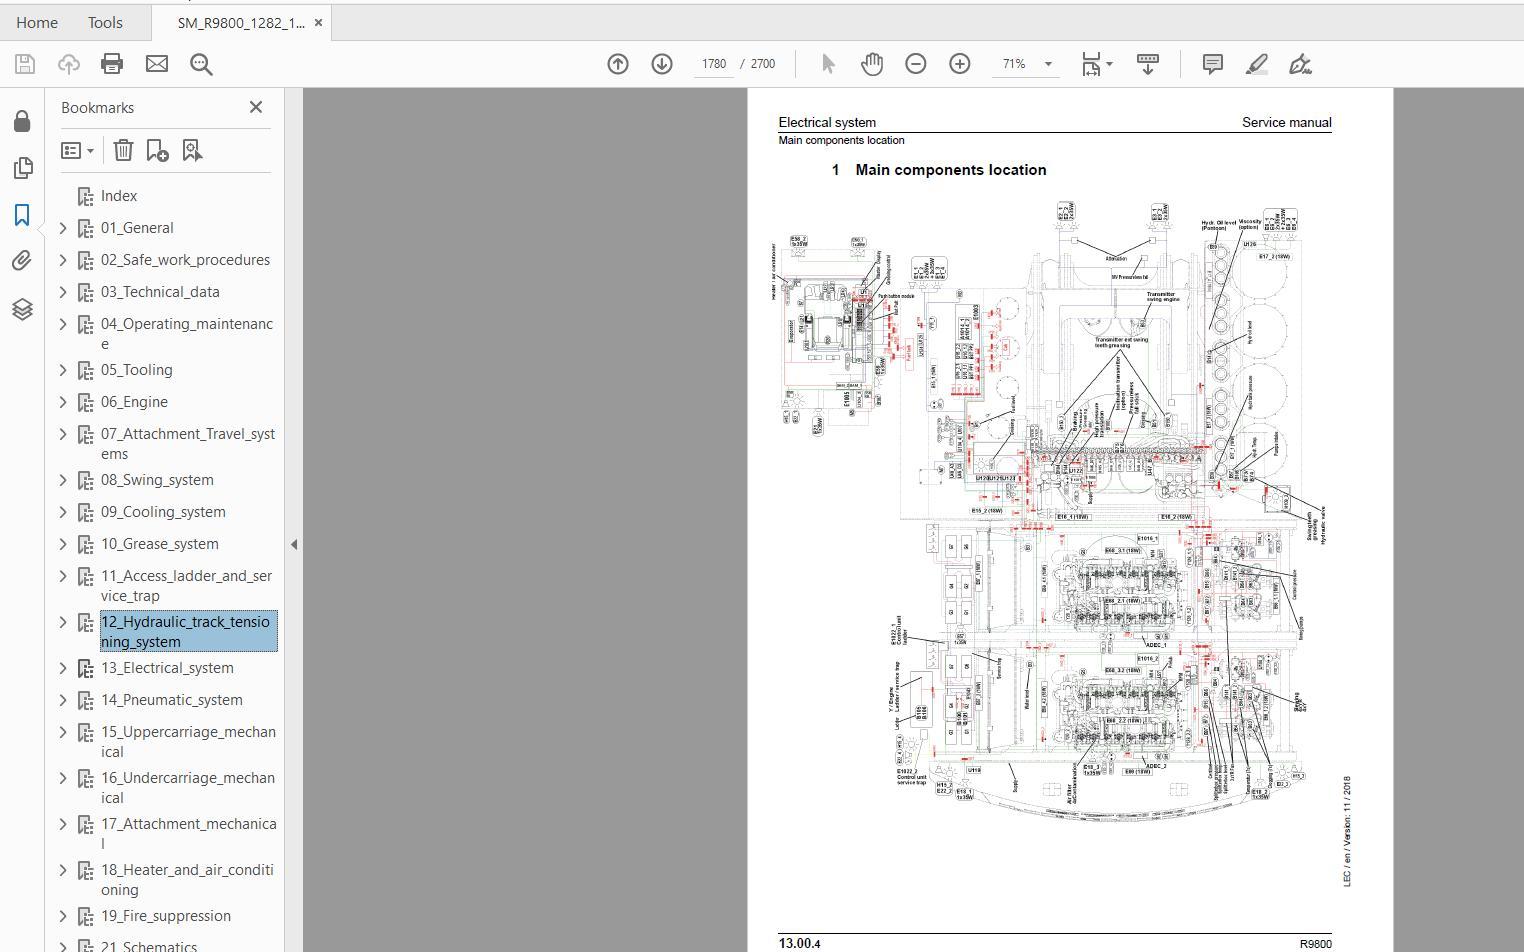 Liebherr_Mining_Excavators_Service_Manual_New_Updated_032020_8